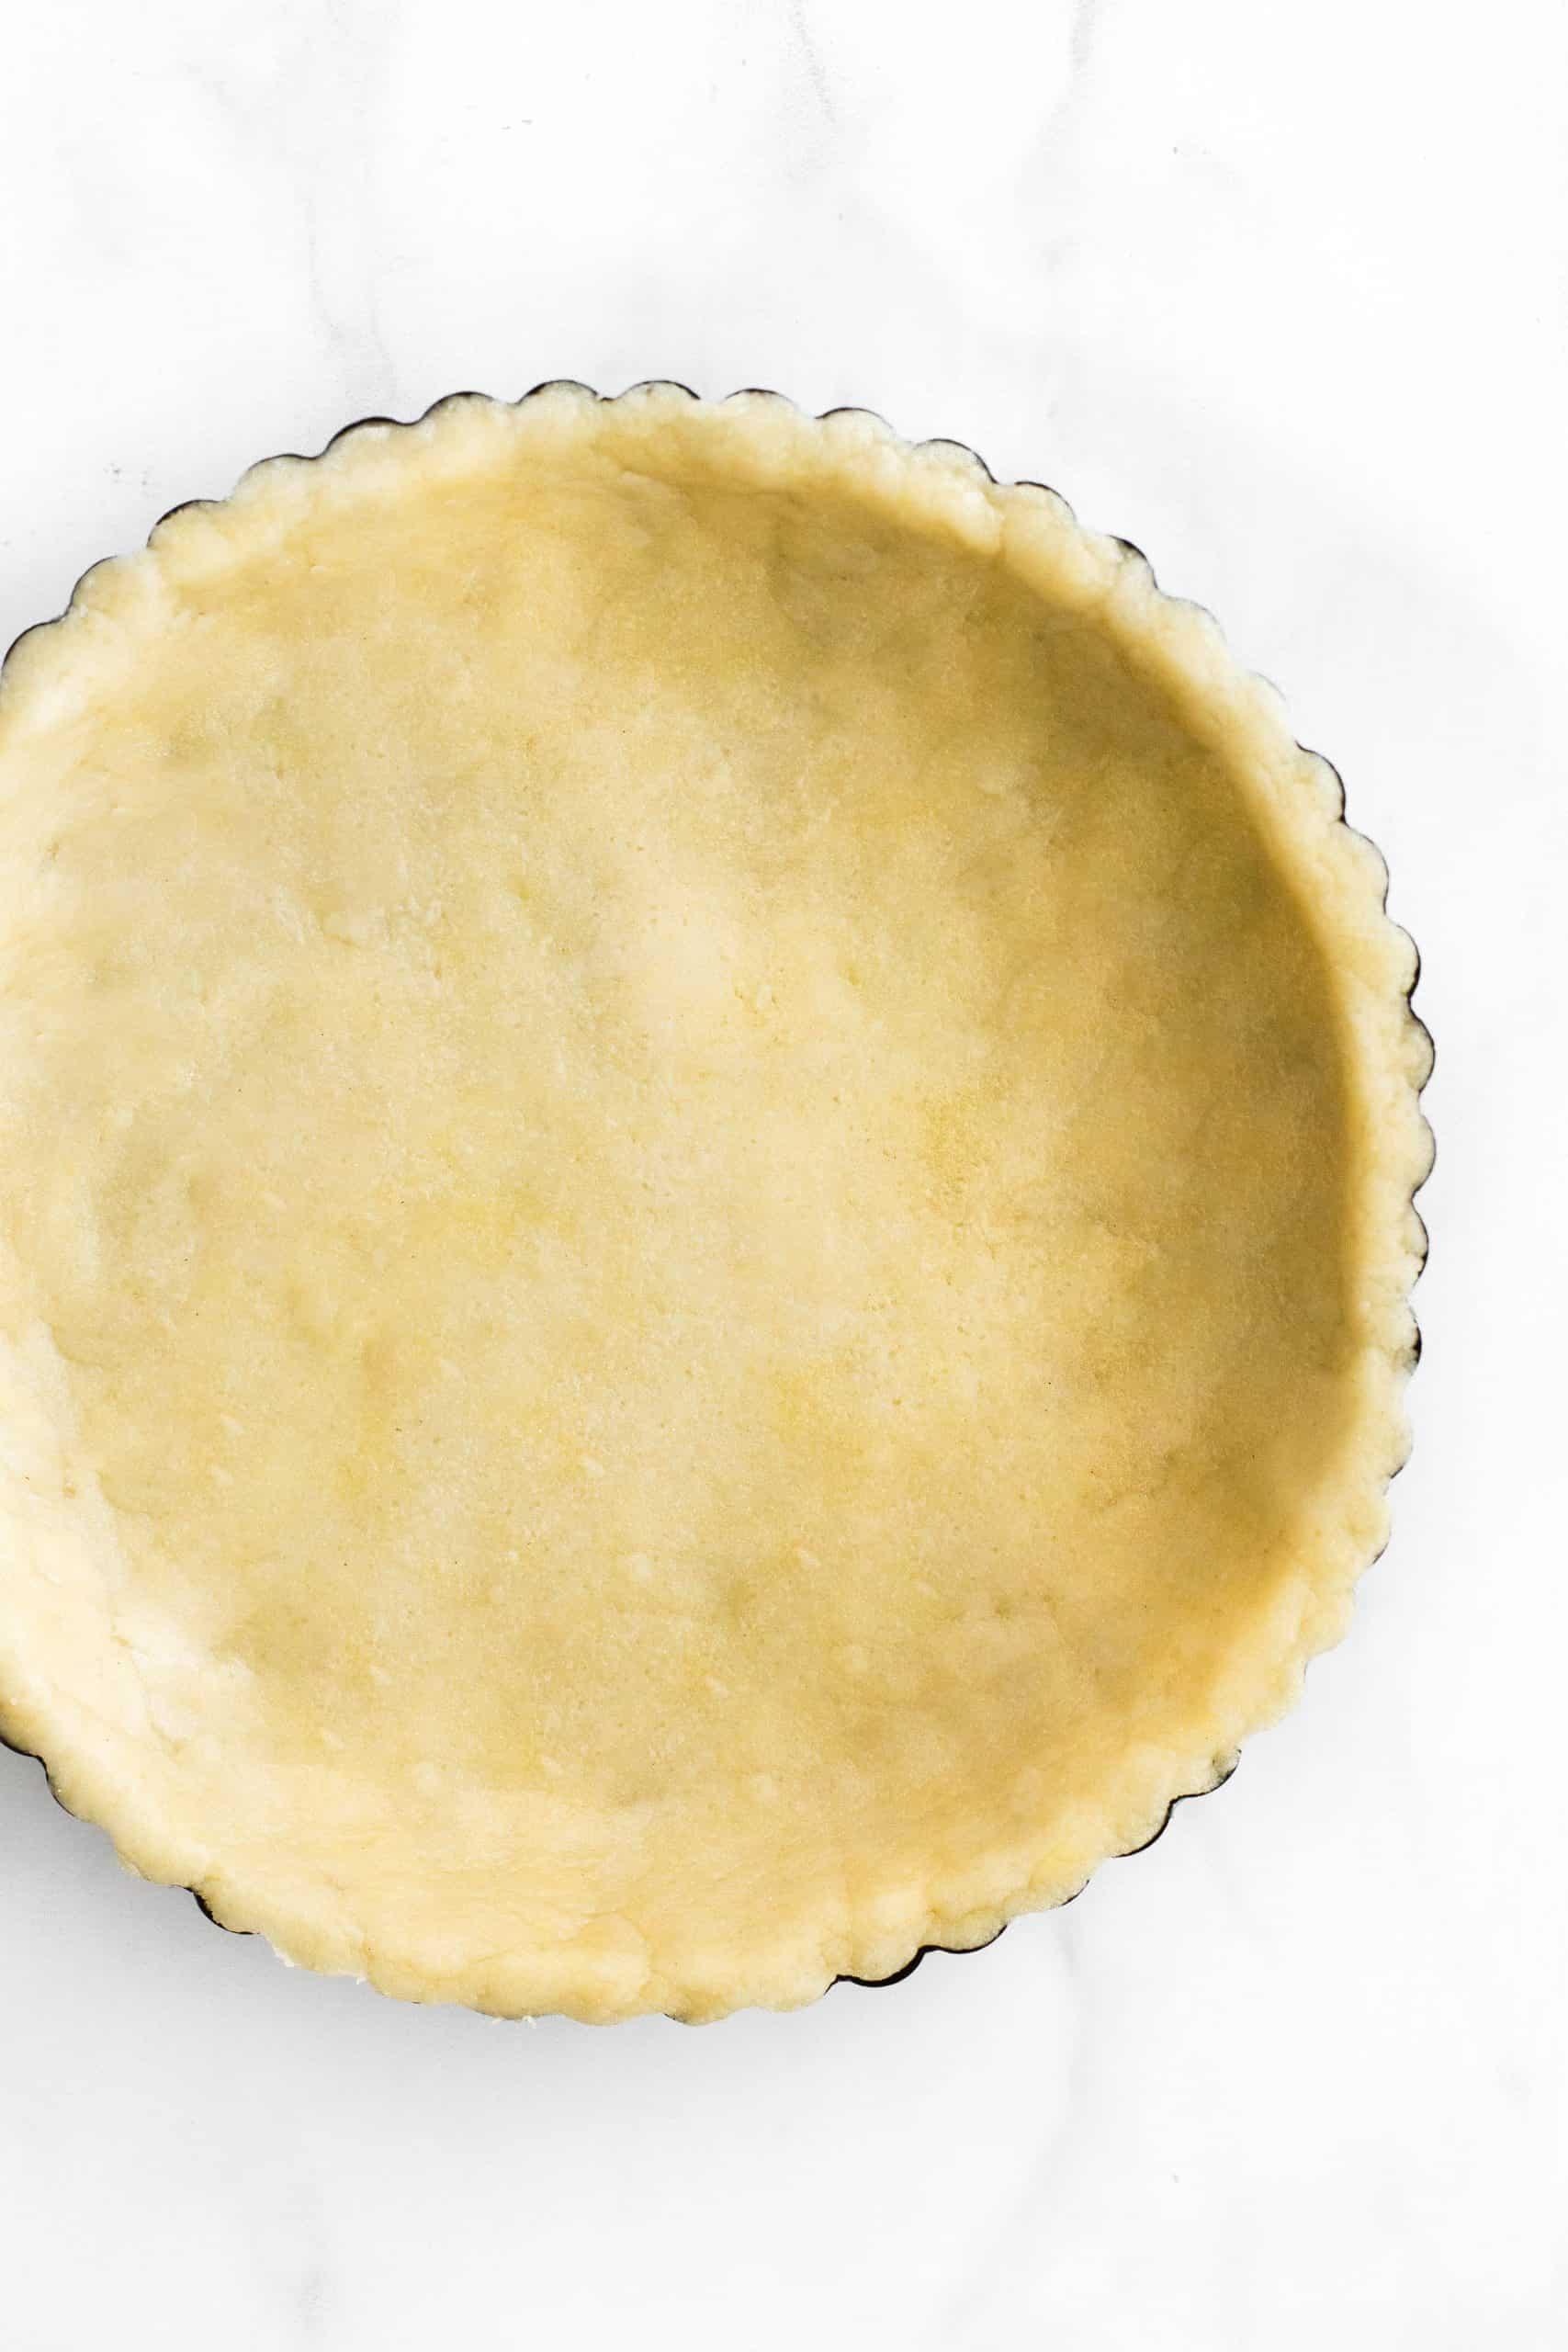 Gluten-free pie crust dough pressed into a metal tin pan.